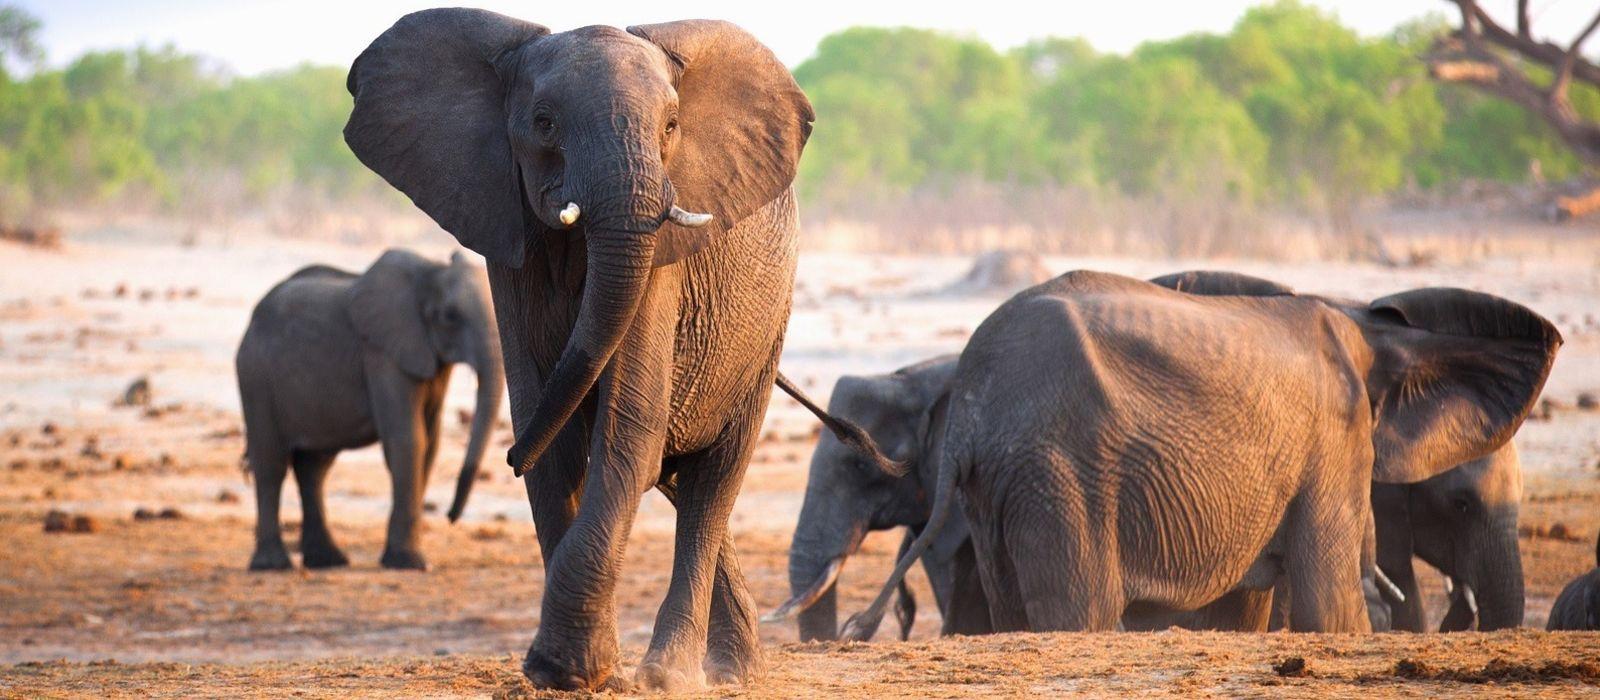 Botswana: Your Wildest Dreams Tour Trip 5